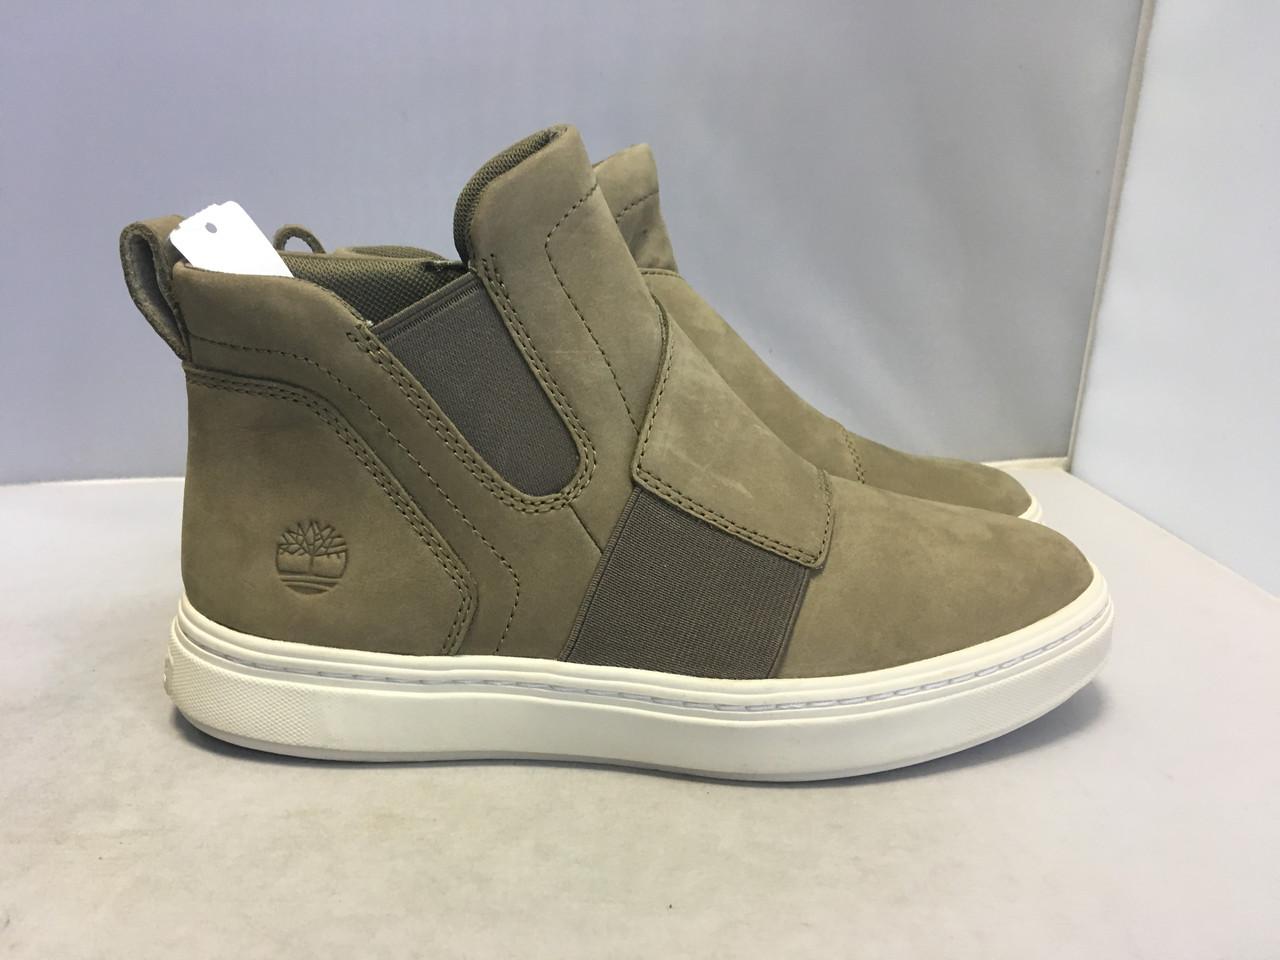 Женские ботинки Timberland, 38 размер, фото 1